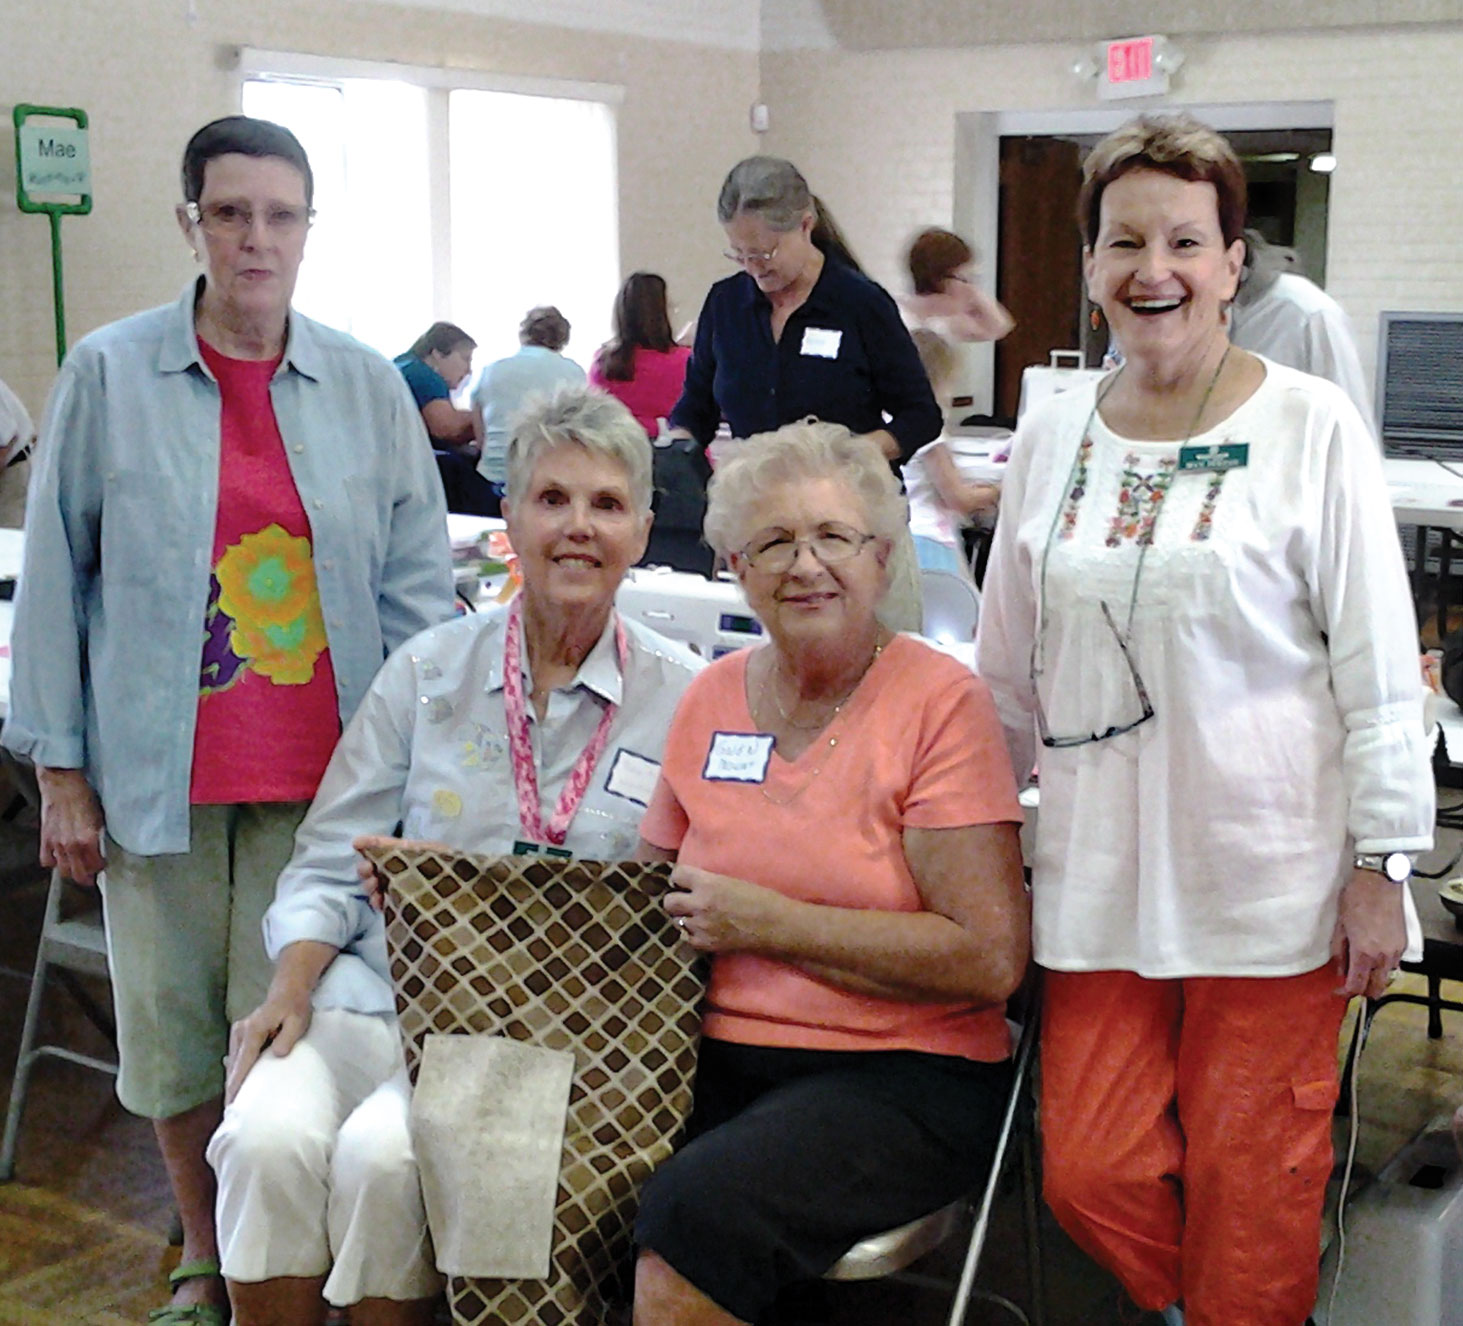 Mary Cerny, Barb Poltl, Gwen Mowat and Max Perzan display a cloth bag.